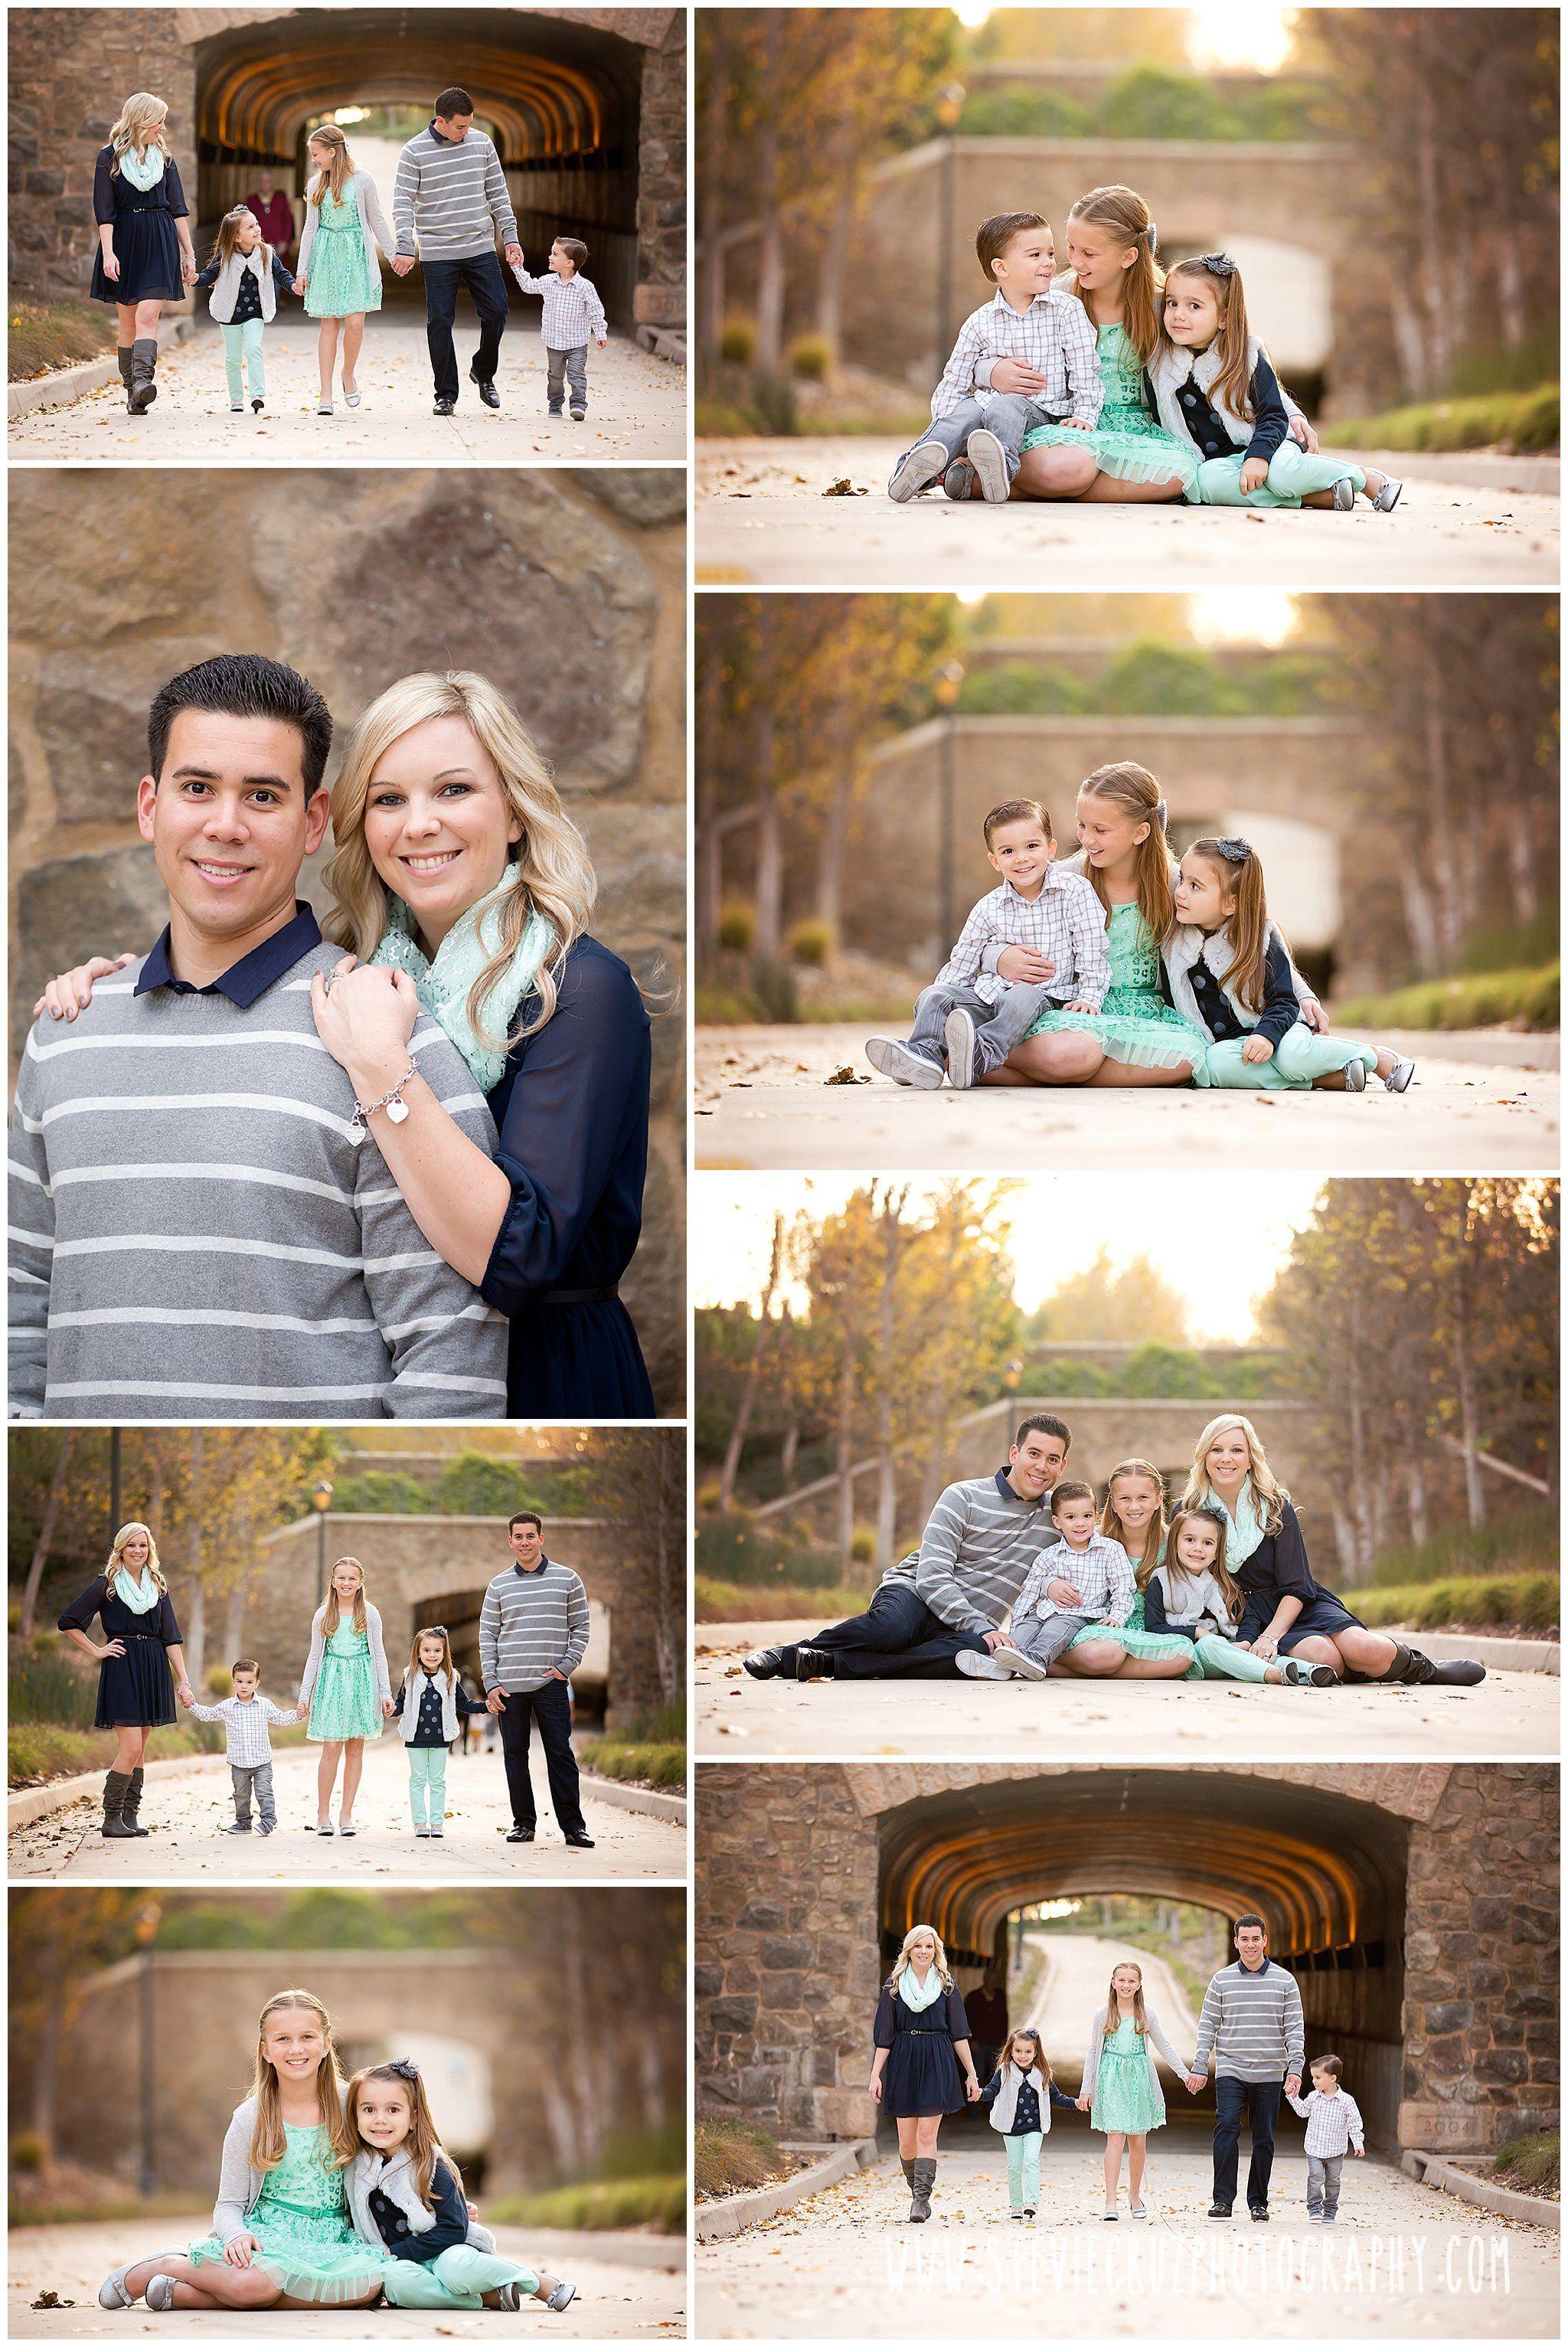 www.steviecruzphotography.com #steviecruzphotography #scp #yorbalinda #yorbalindaphotographer #familyphoto #orangecountyphotography #california #backlit #seasonalphotography #outdoor #naturallight #family #kids #orangecountyphotographer #california #canon  #tealandblue #tealandnavy #silverandblue #grandkidsphotography